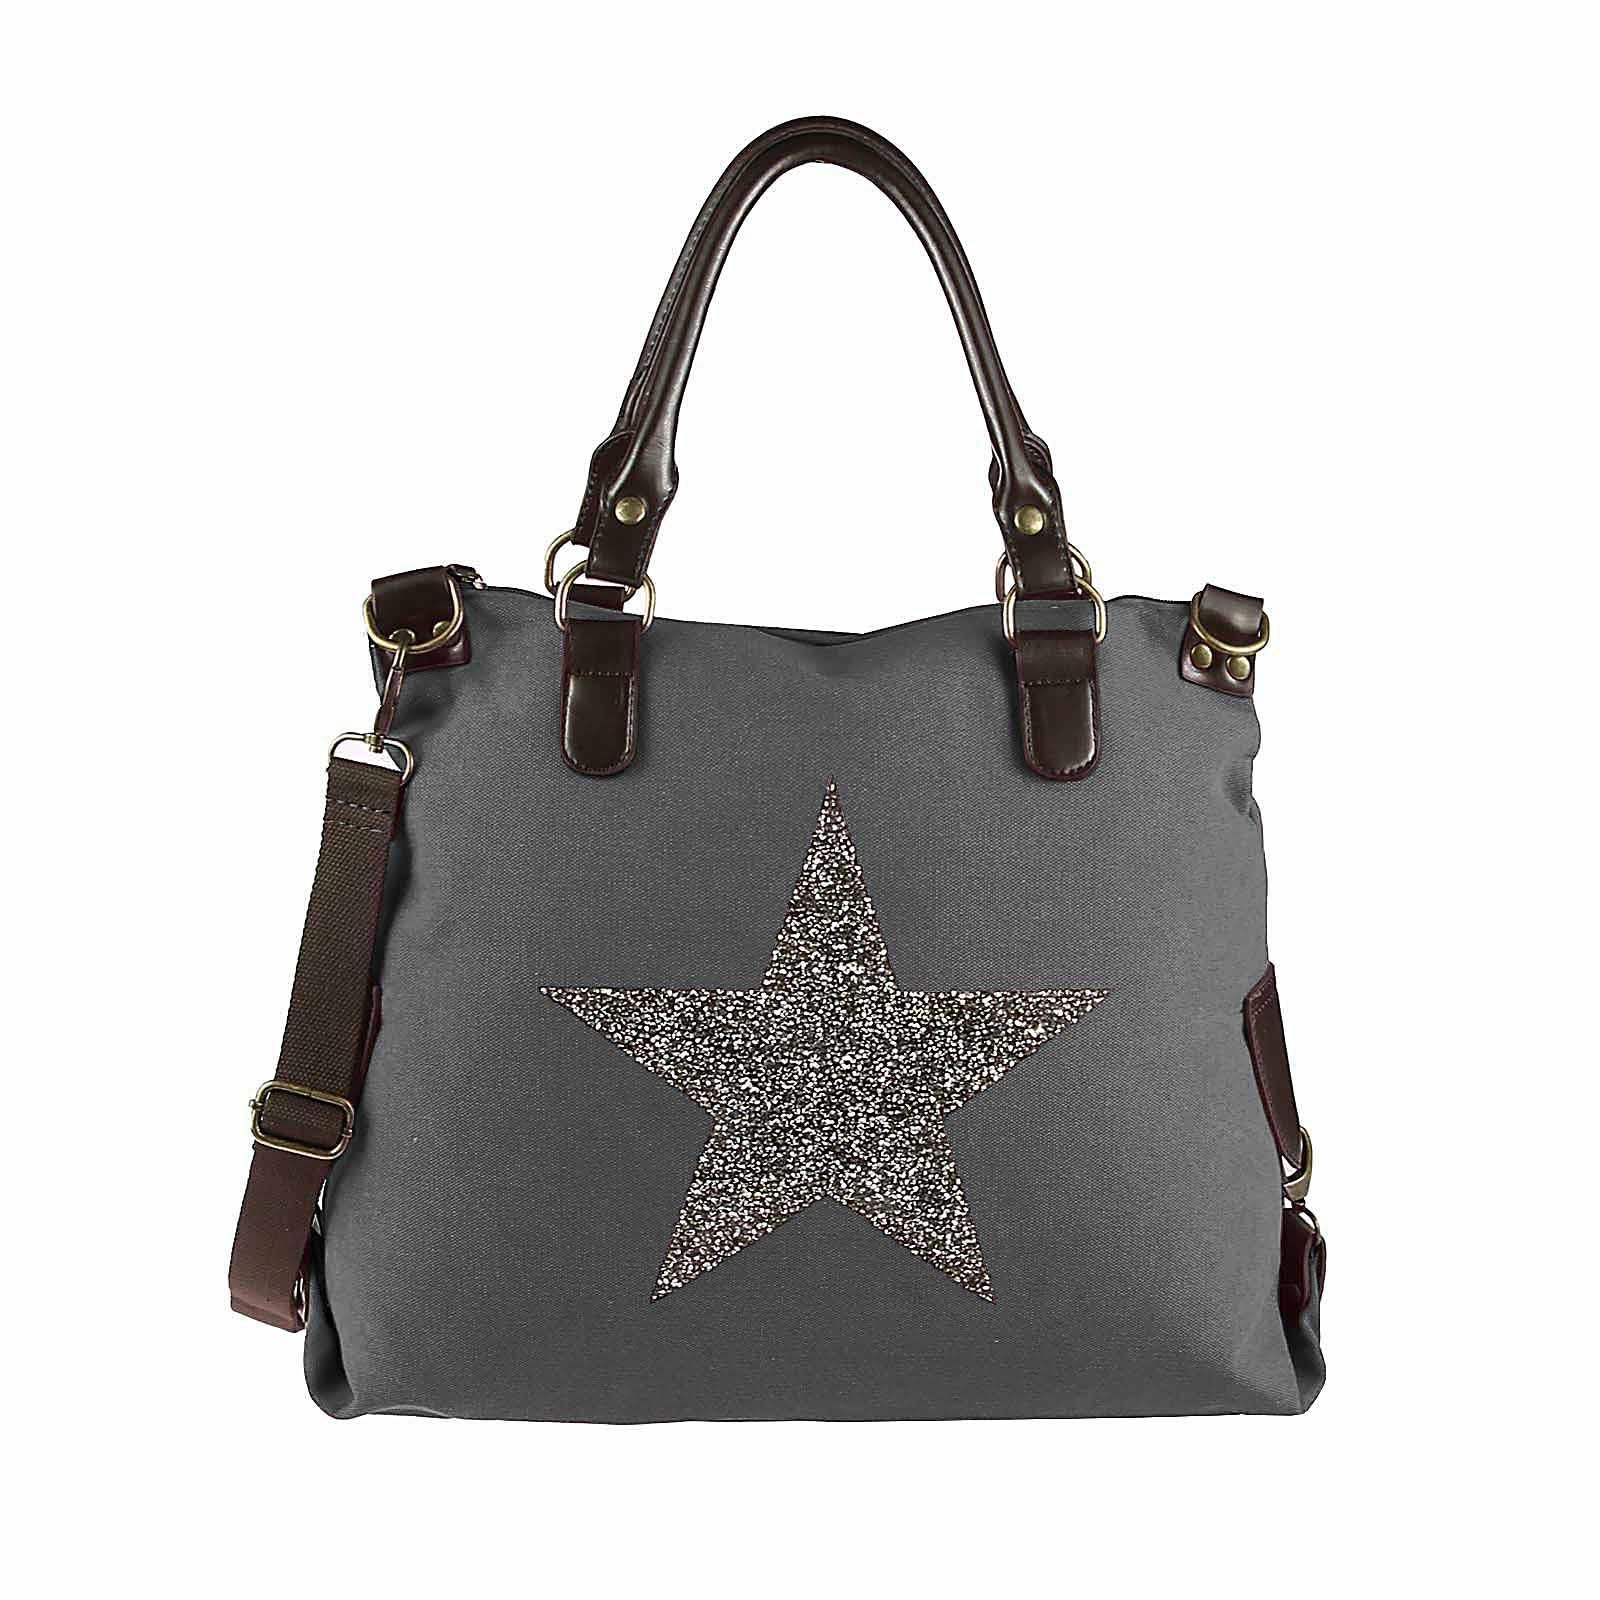 ital design DIN A4 Stern Tasche Handtasche Leder Damentasche